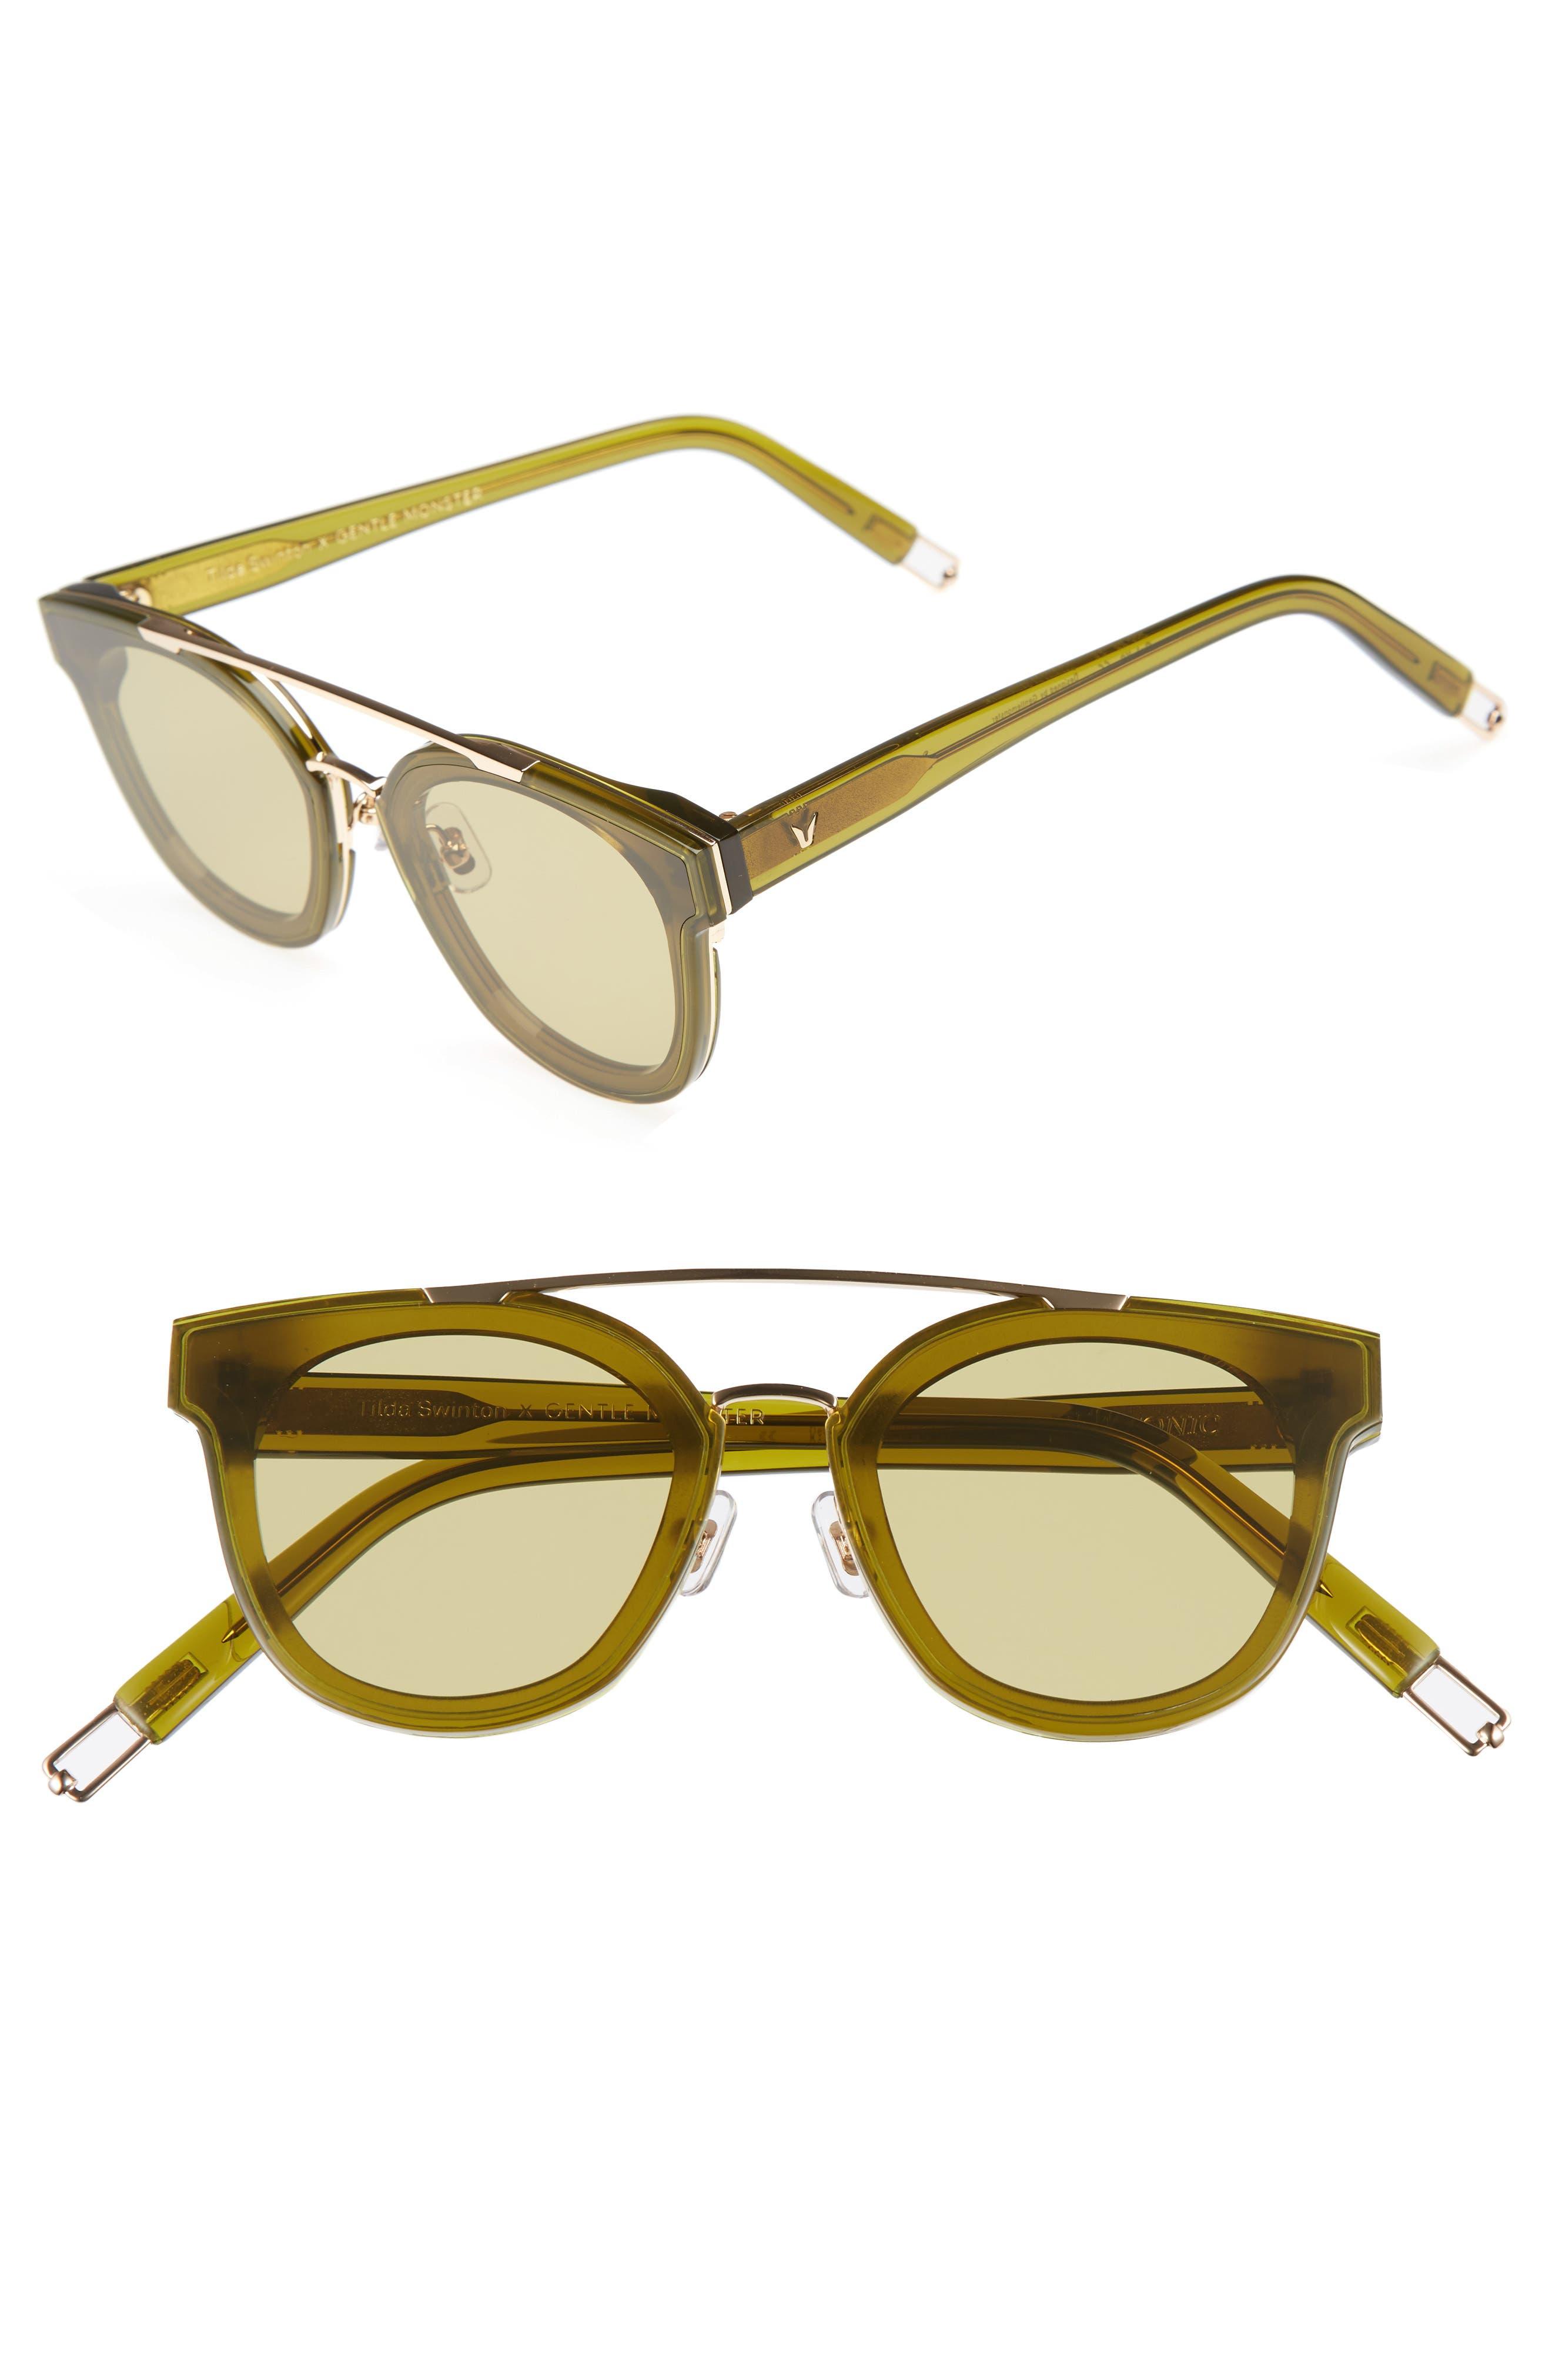 Tilda Swinton x Gentle Monster Newtonic 60mm Rounded Sunglasses,                             Main thumbnail 3, color,